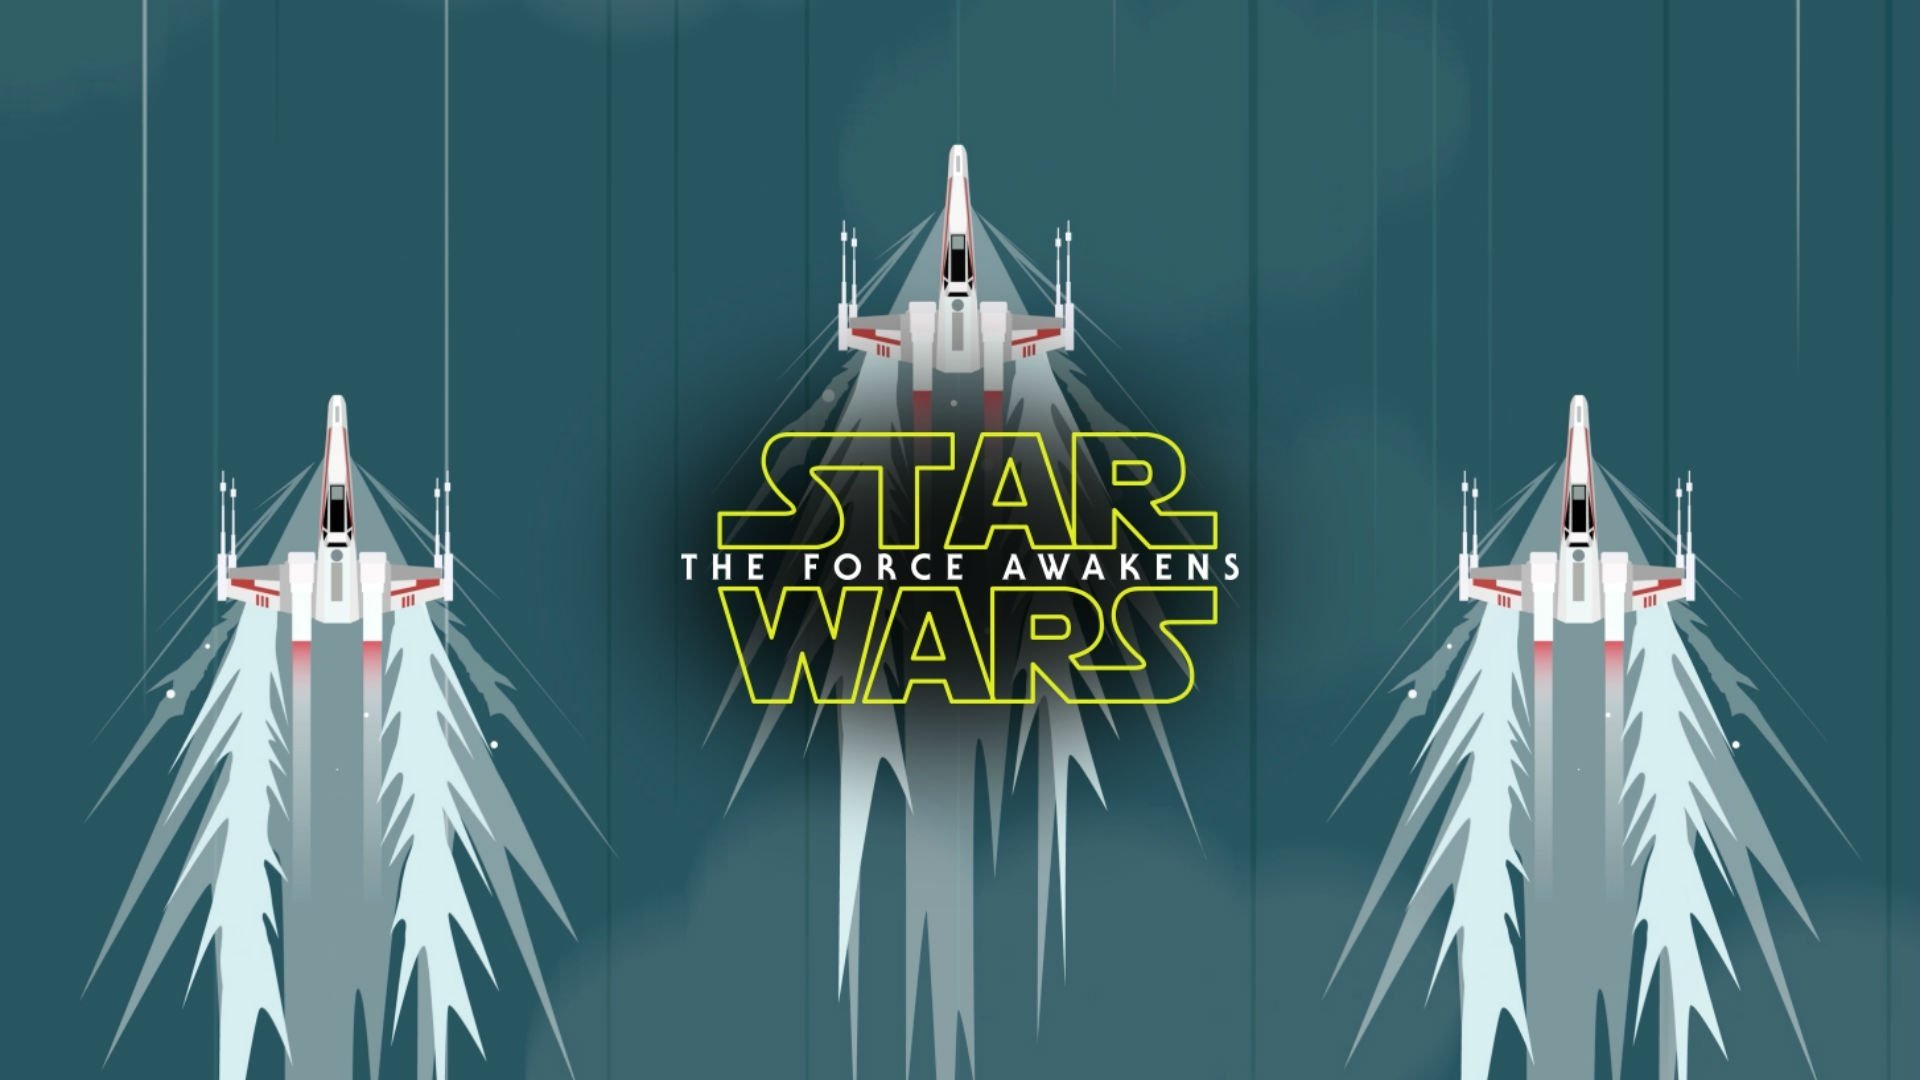 Star wars episode vii the force awakens hd wallpaper - Star wars the force awakens desktop wallpaper ...